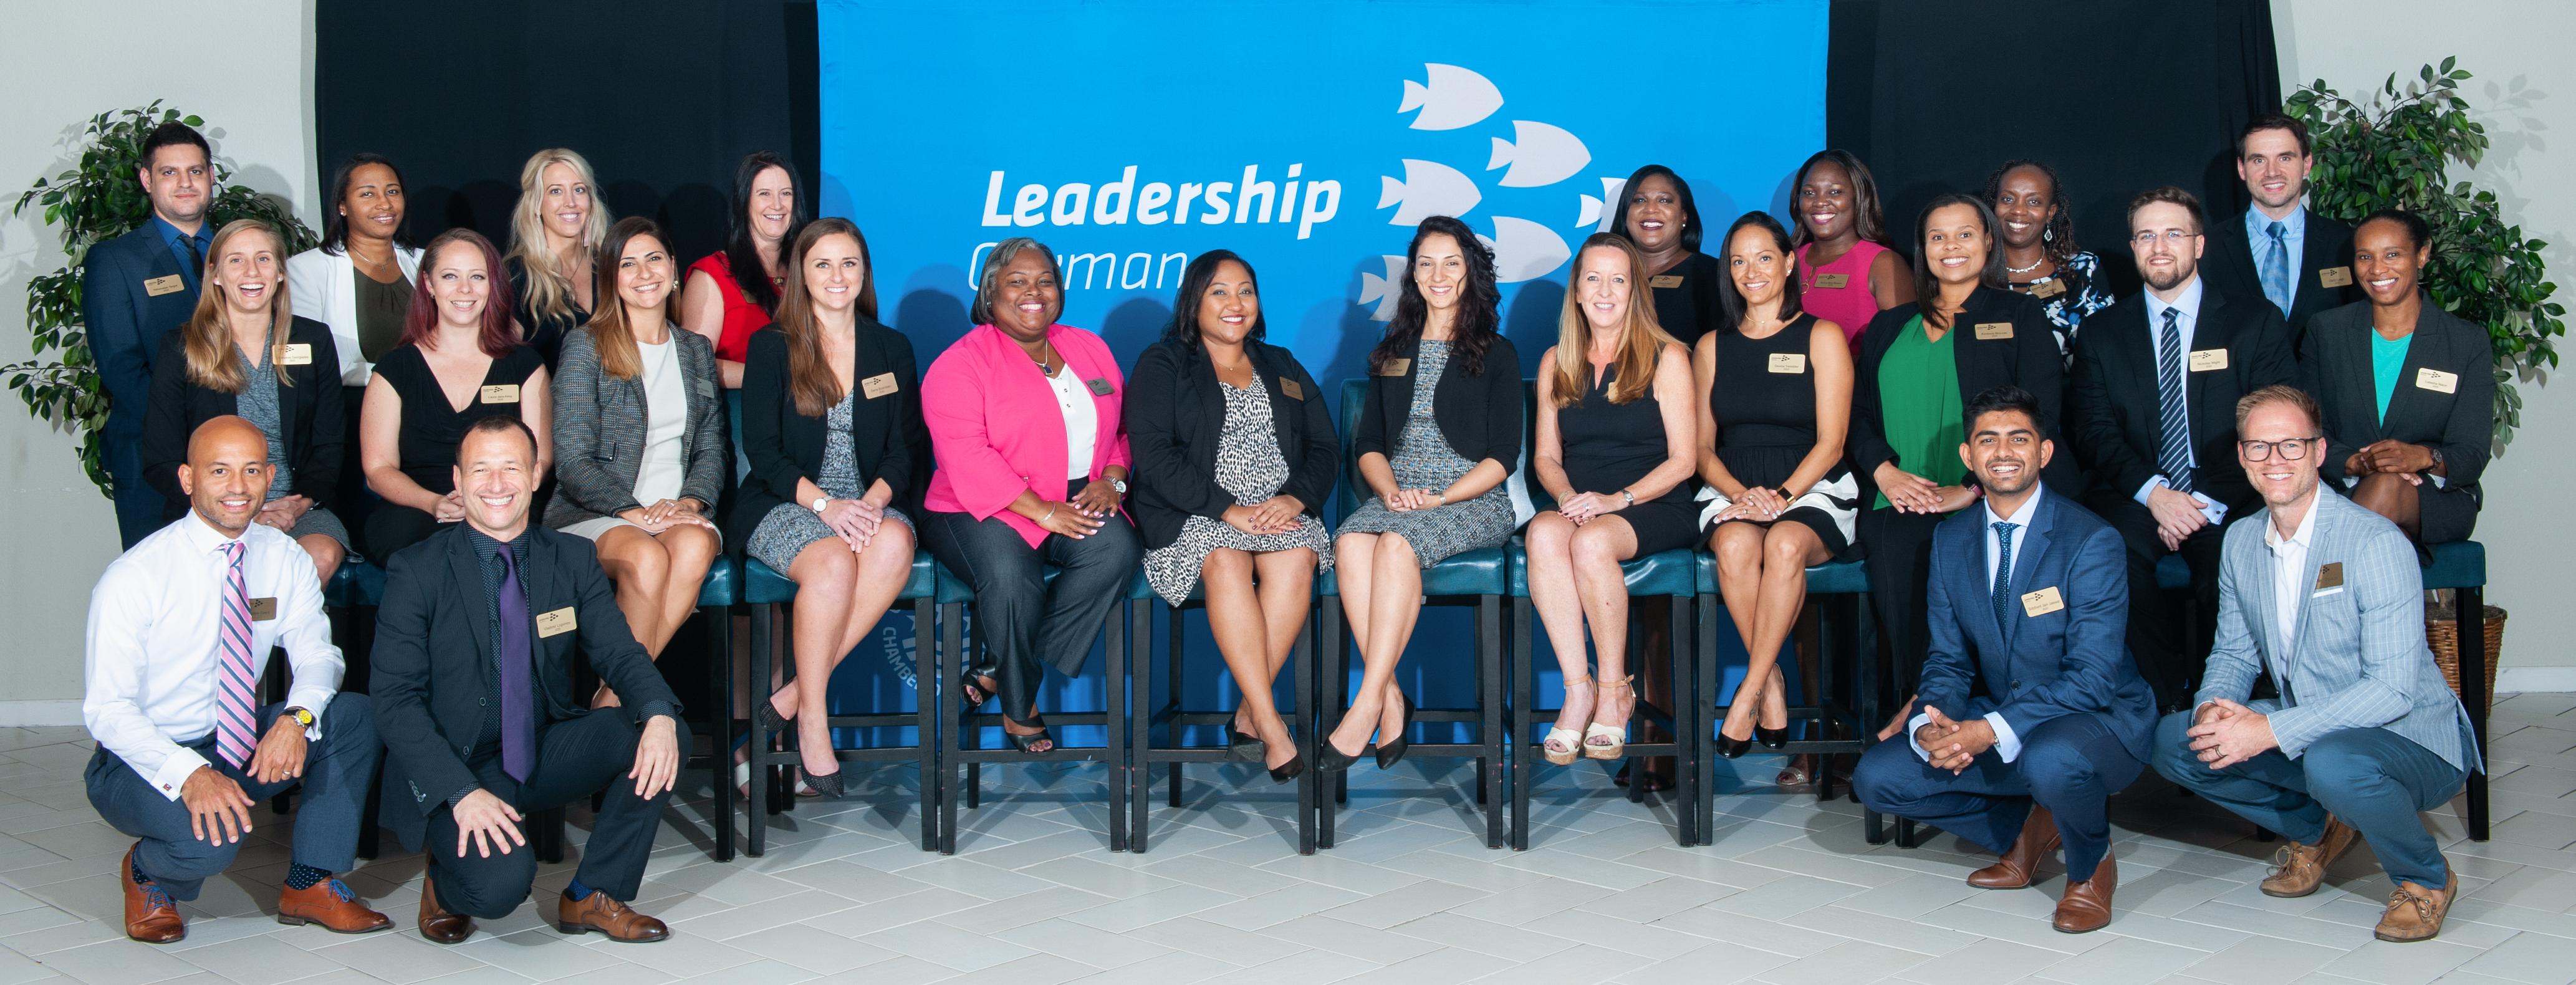 Leadership Cayman Portraits OCt. 16